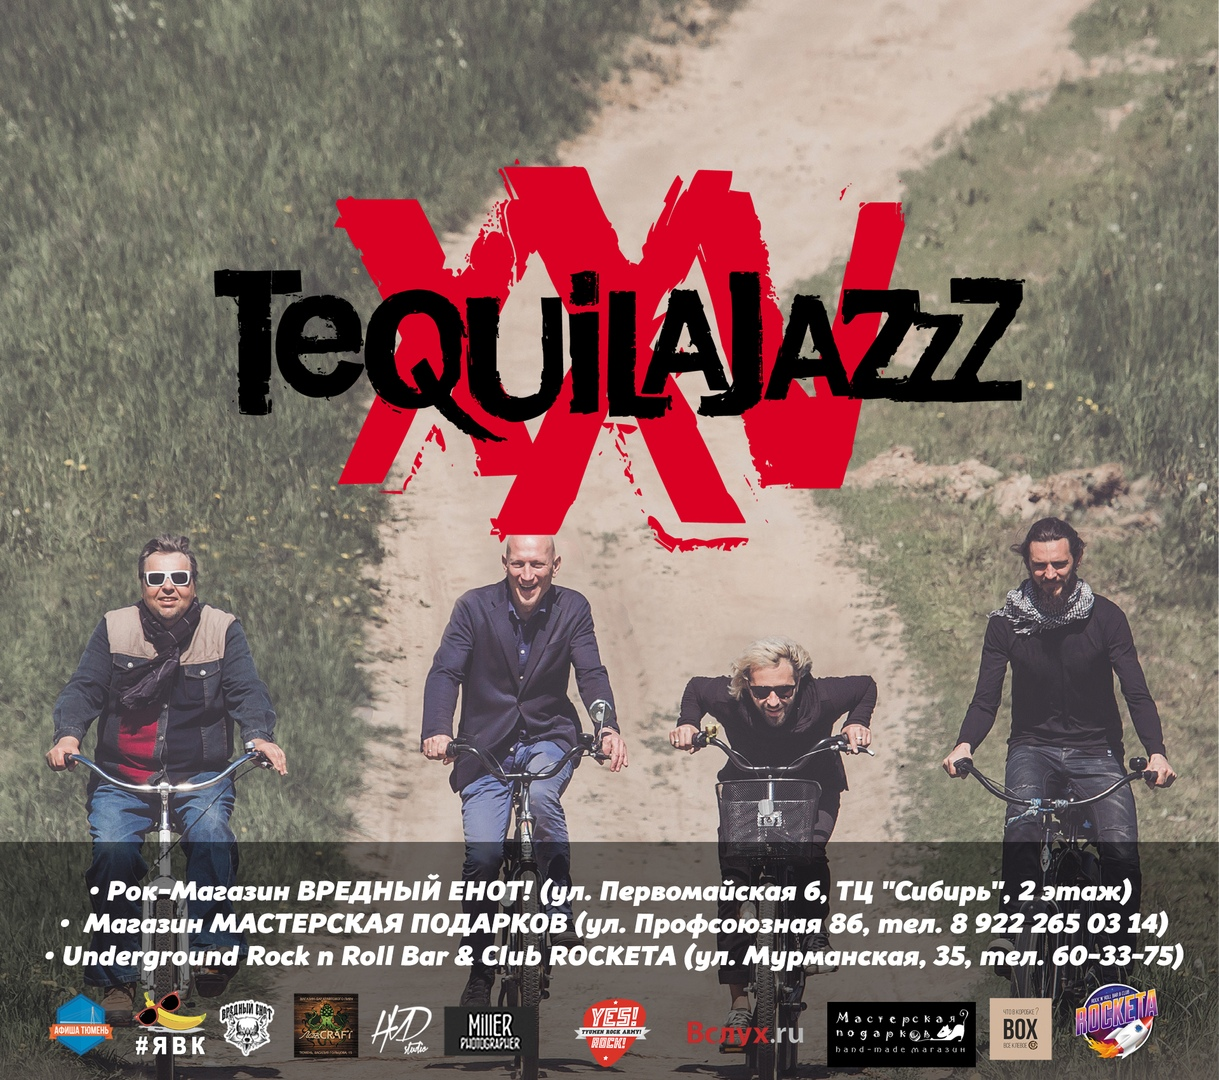 Афиша 20.10 // Tequilajazzz в Тюмени! // YesRockClub